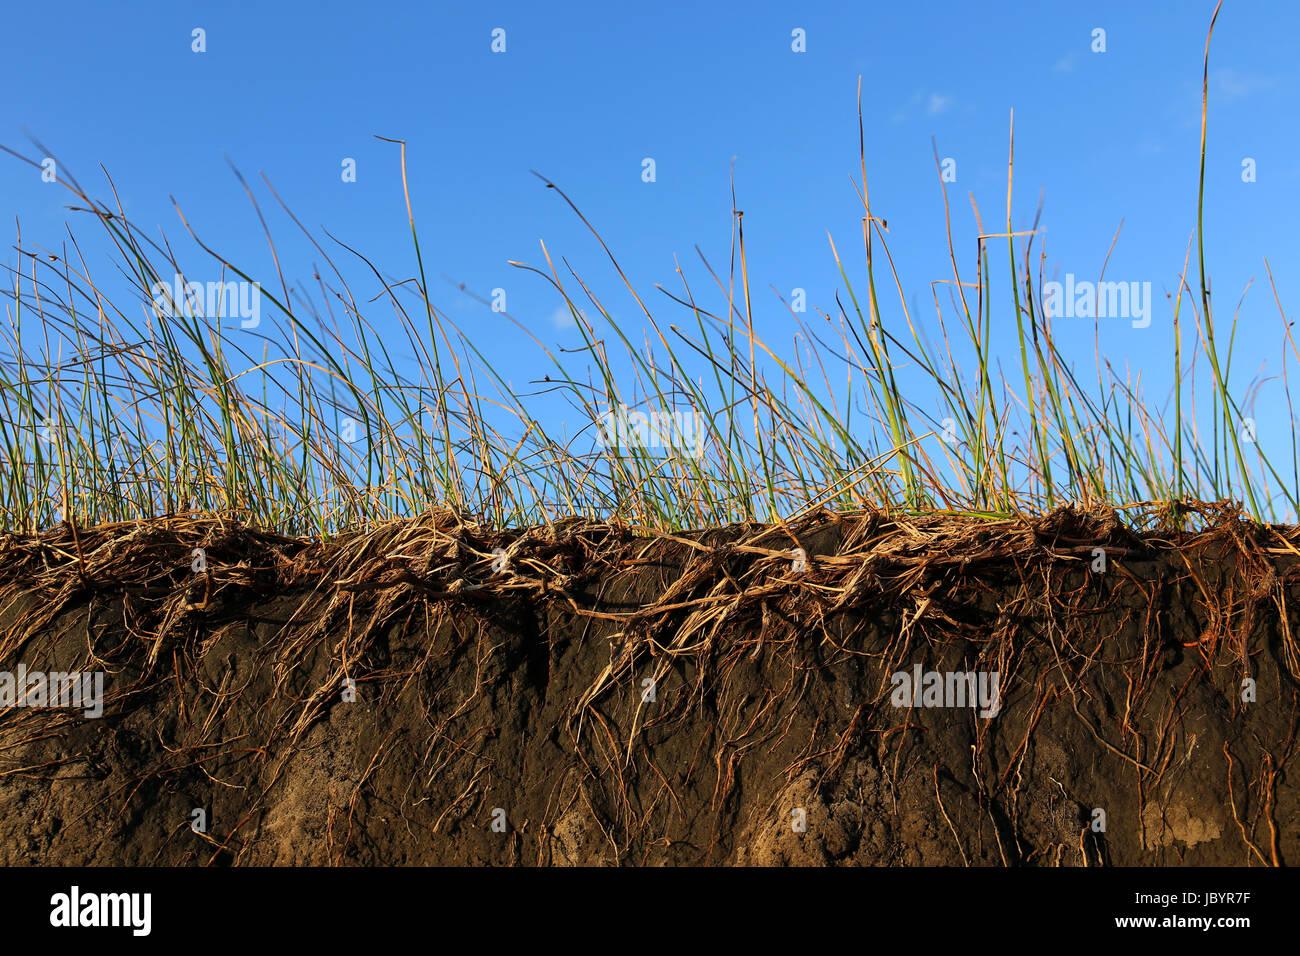 Erosion of the Soil - Stock Image